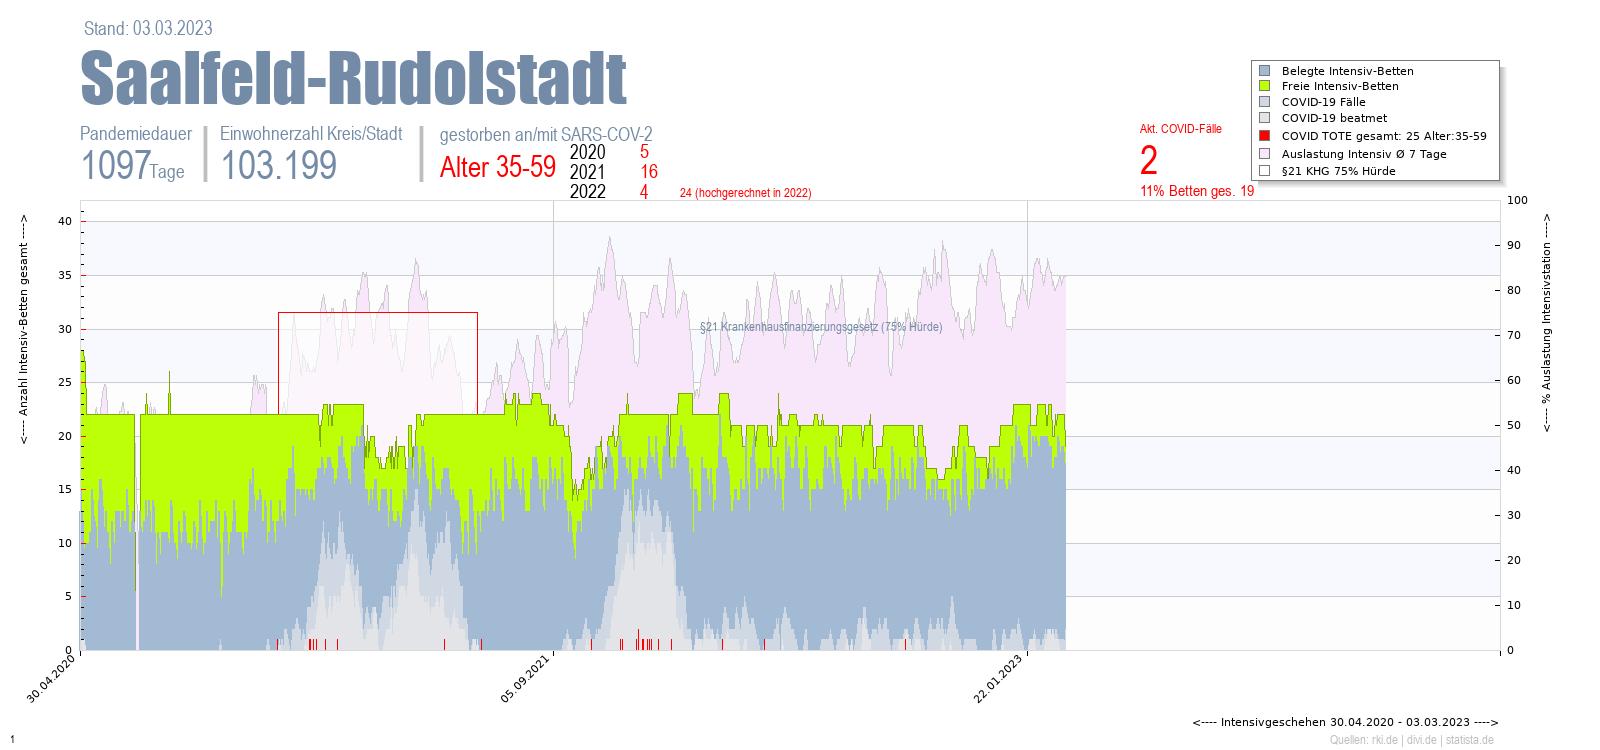 Intensivstation Auslastung Saalfeld-Rudolstadt Alter 0-4